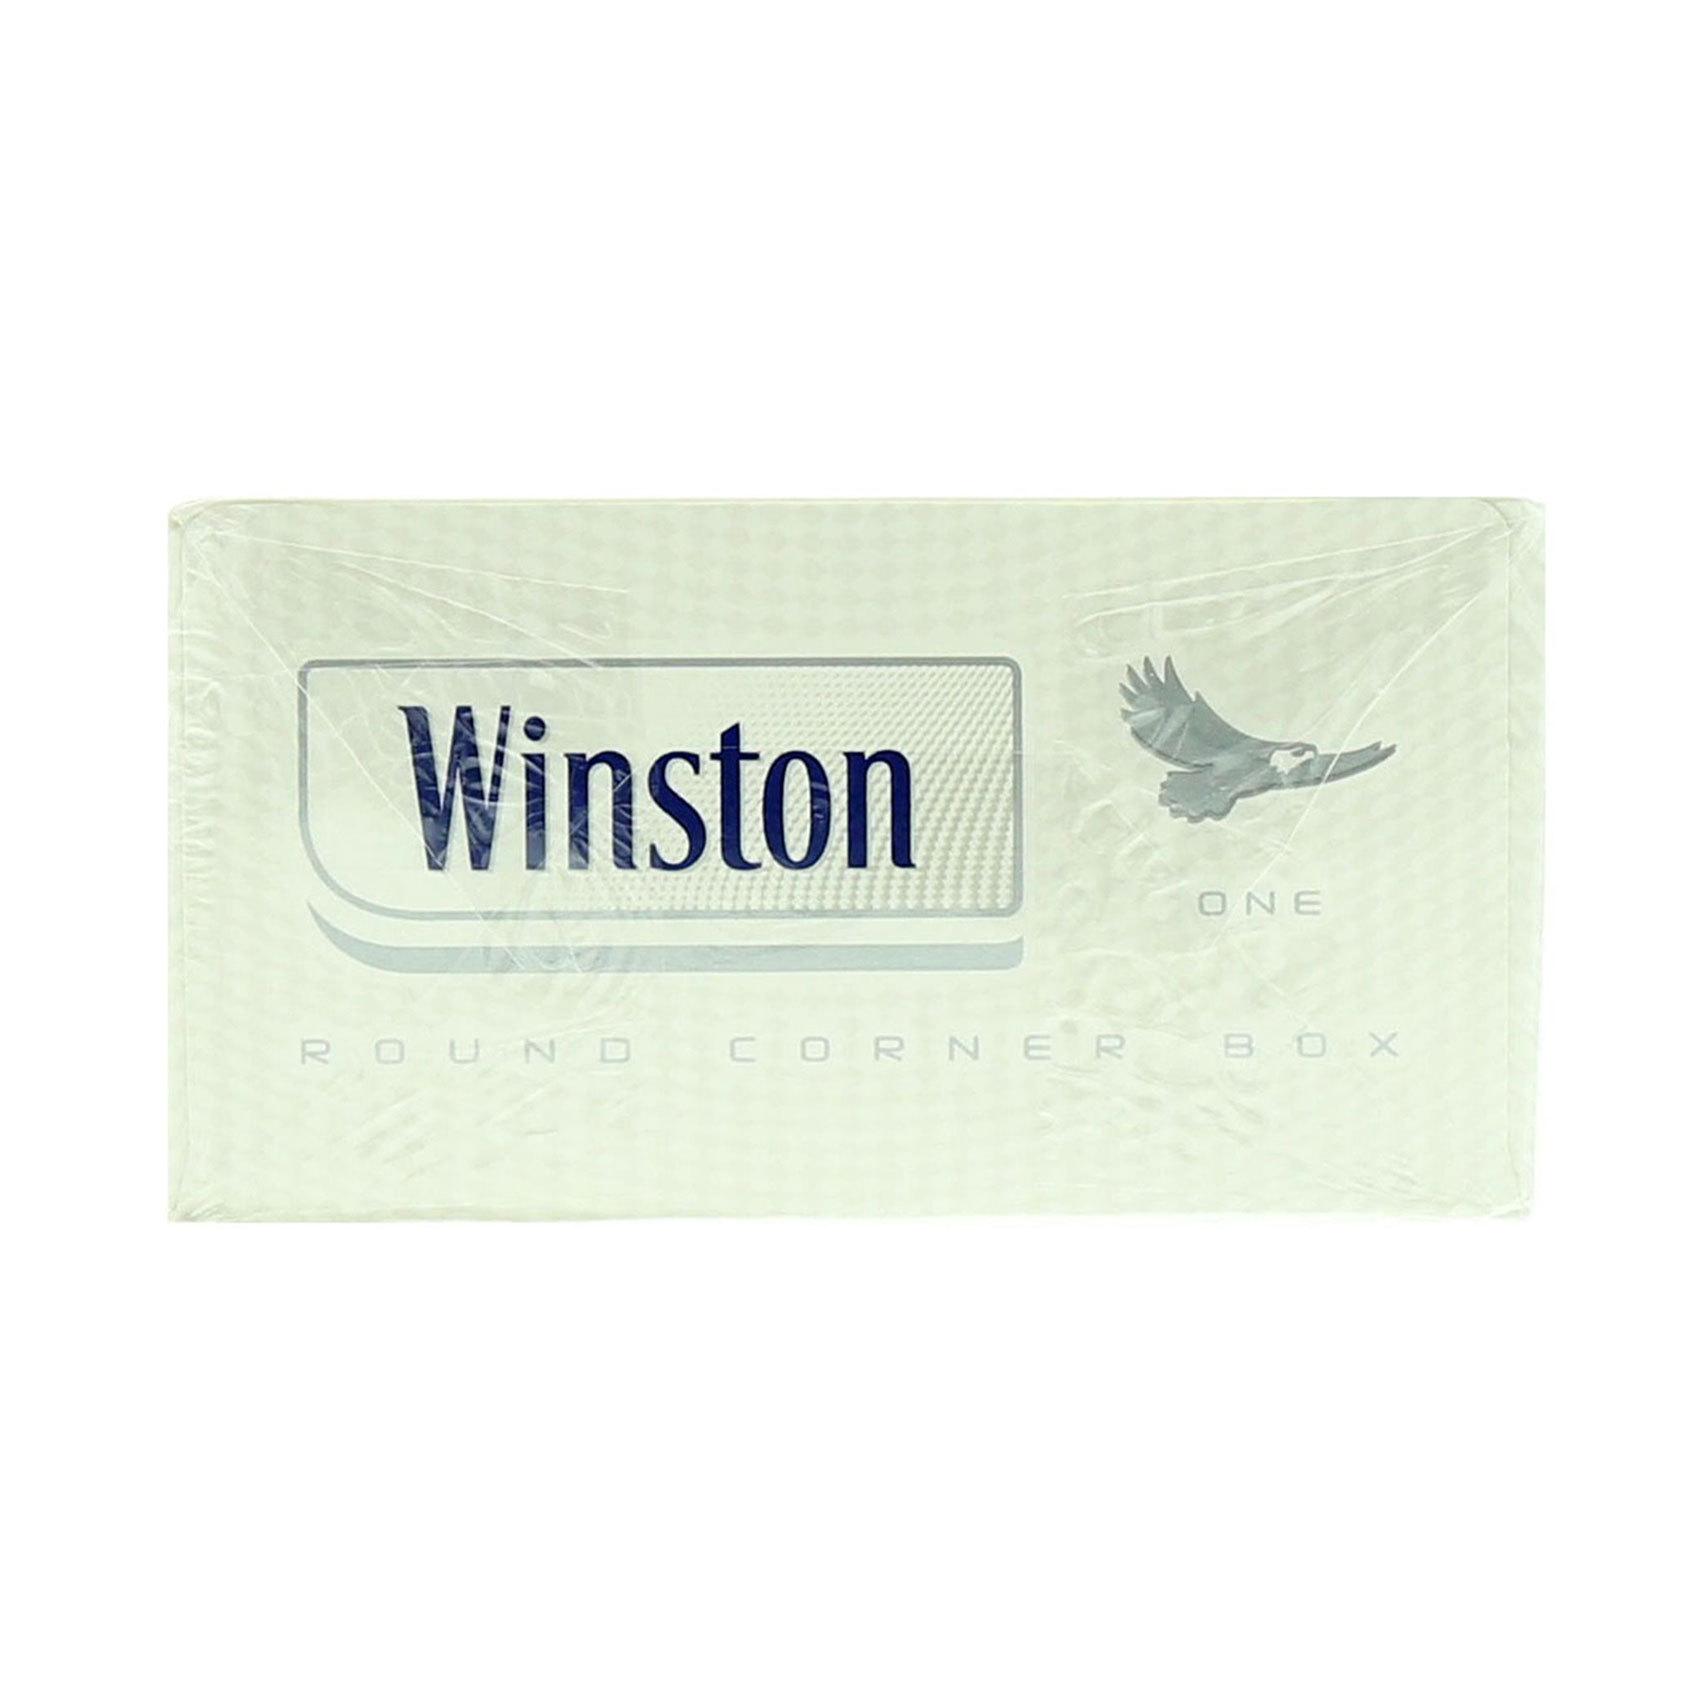 WINSTON ONE KING SIZE 20X10